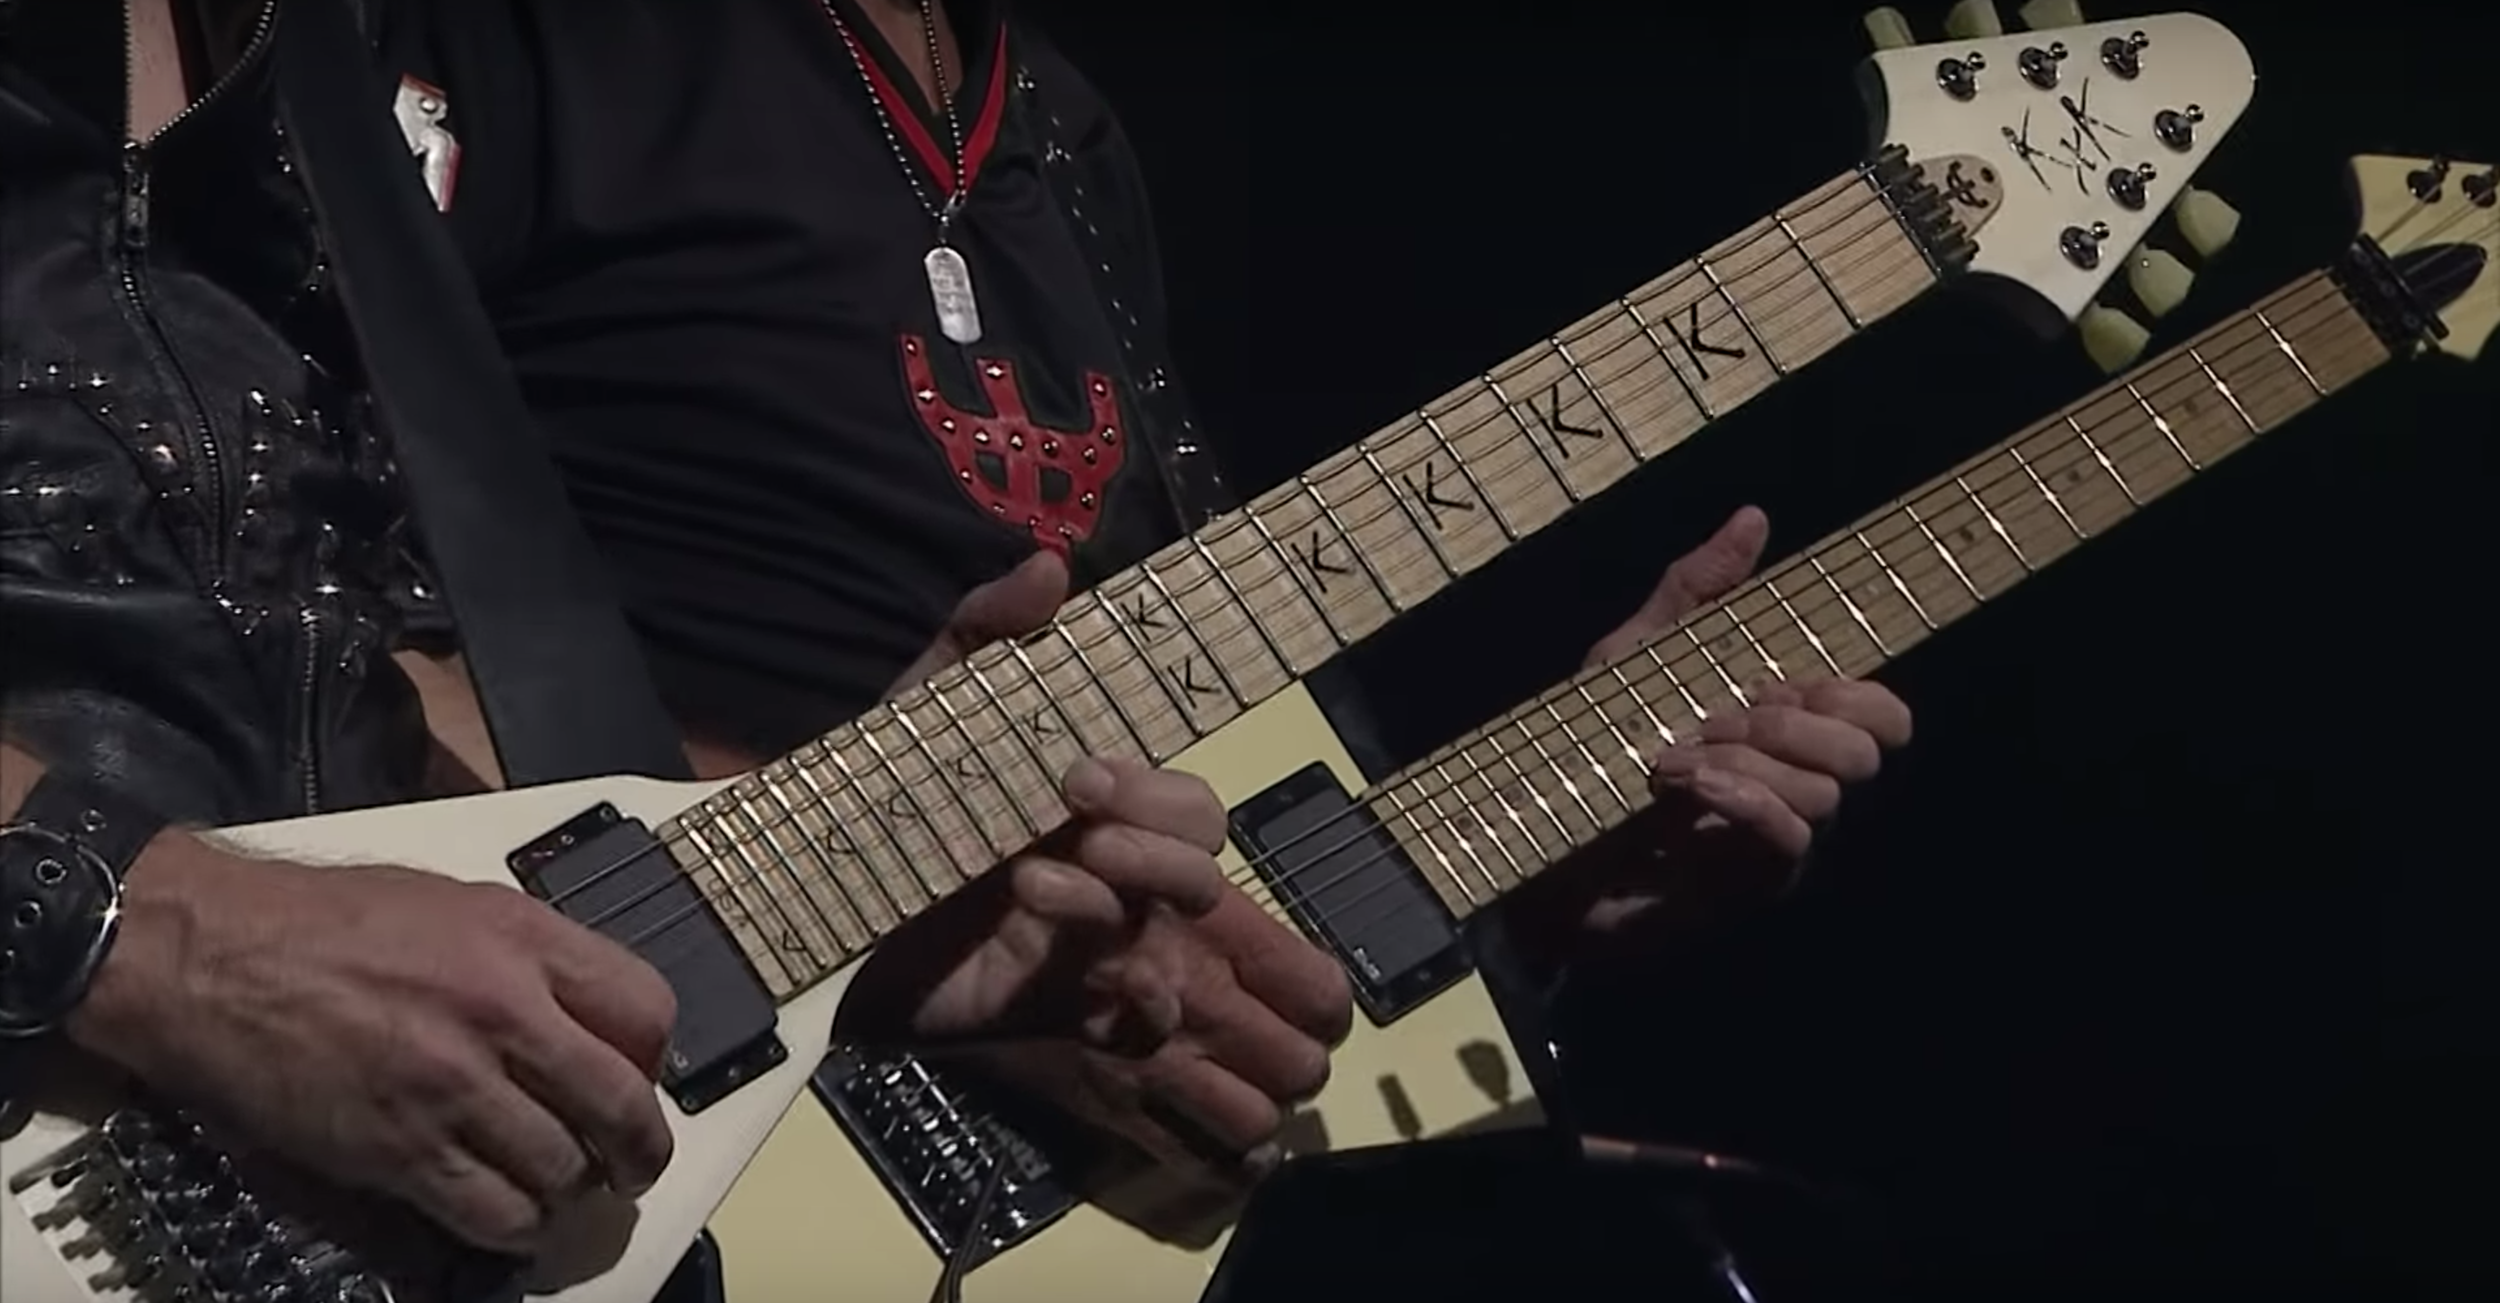 Sarika Rice of Desert Scene London selects Judas Priest live